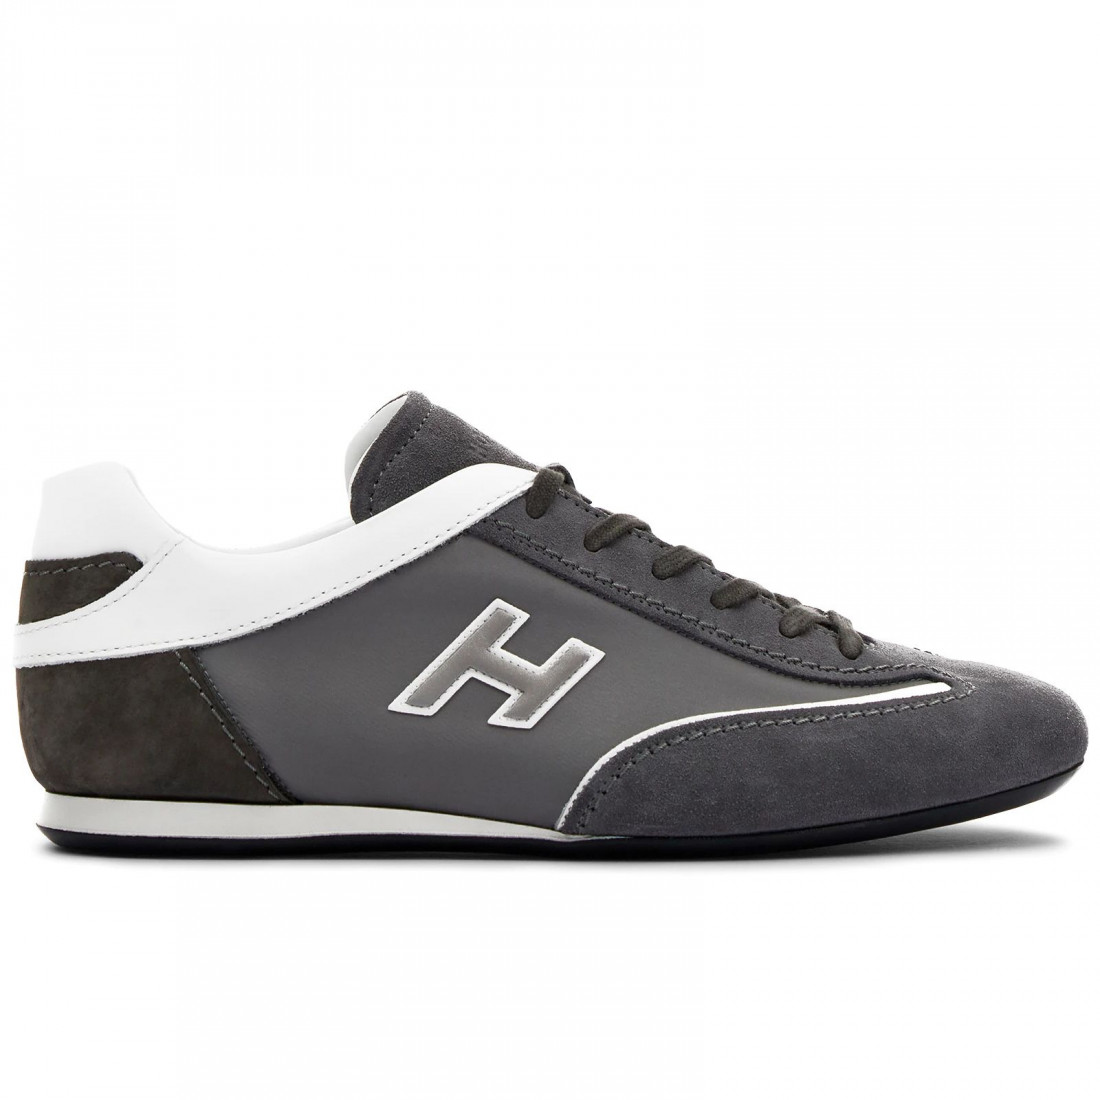 sneakers uomo hogan hxm05201686p9v1rs0 8205